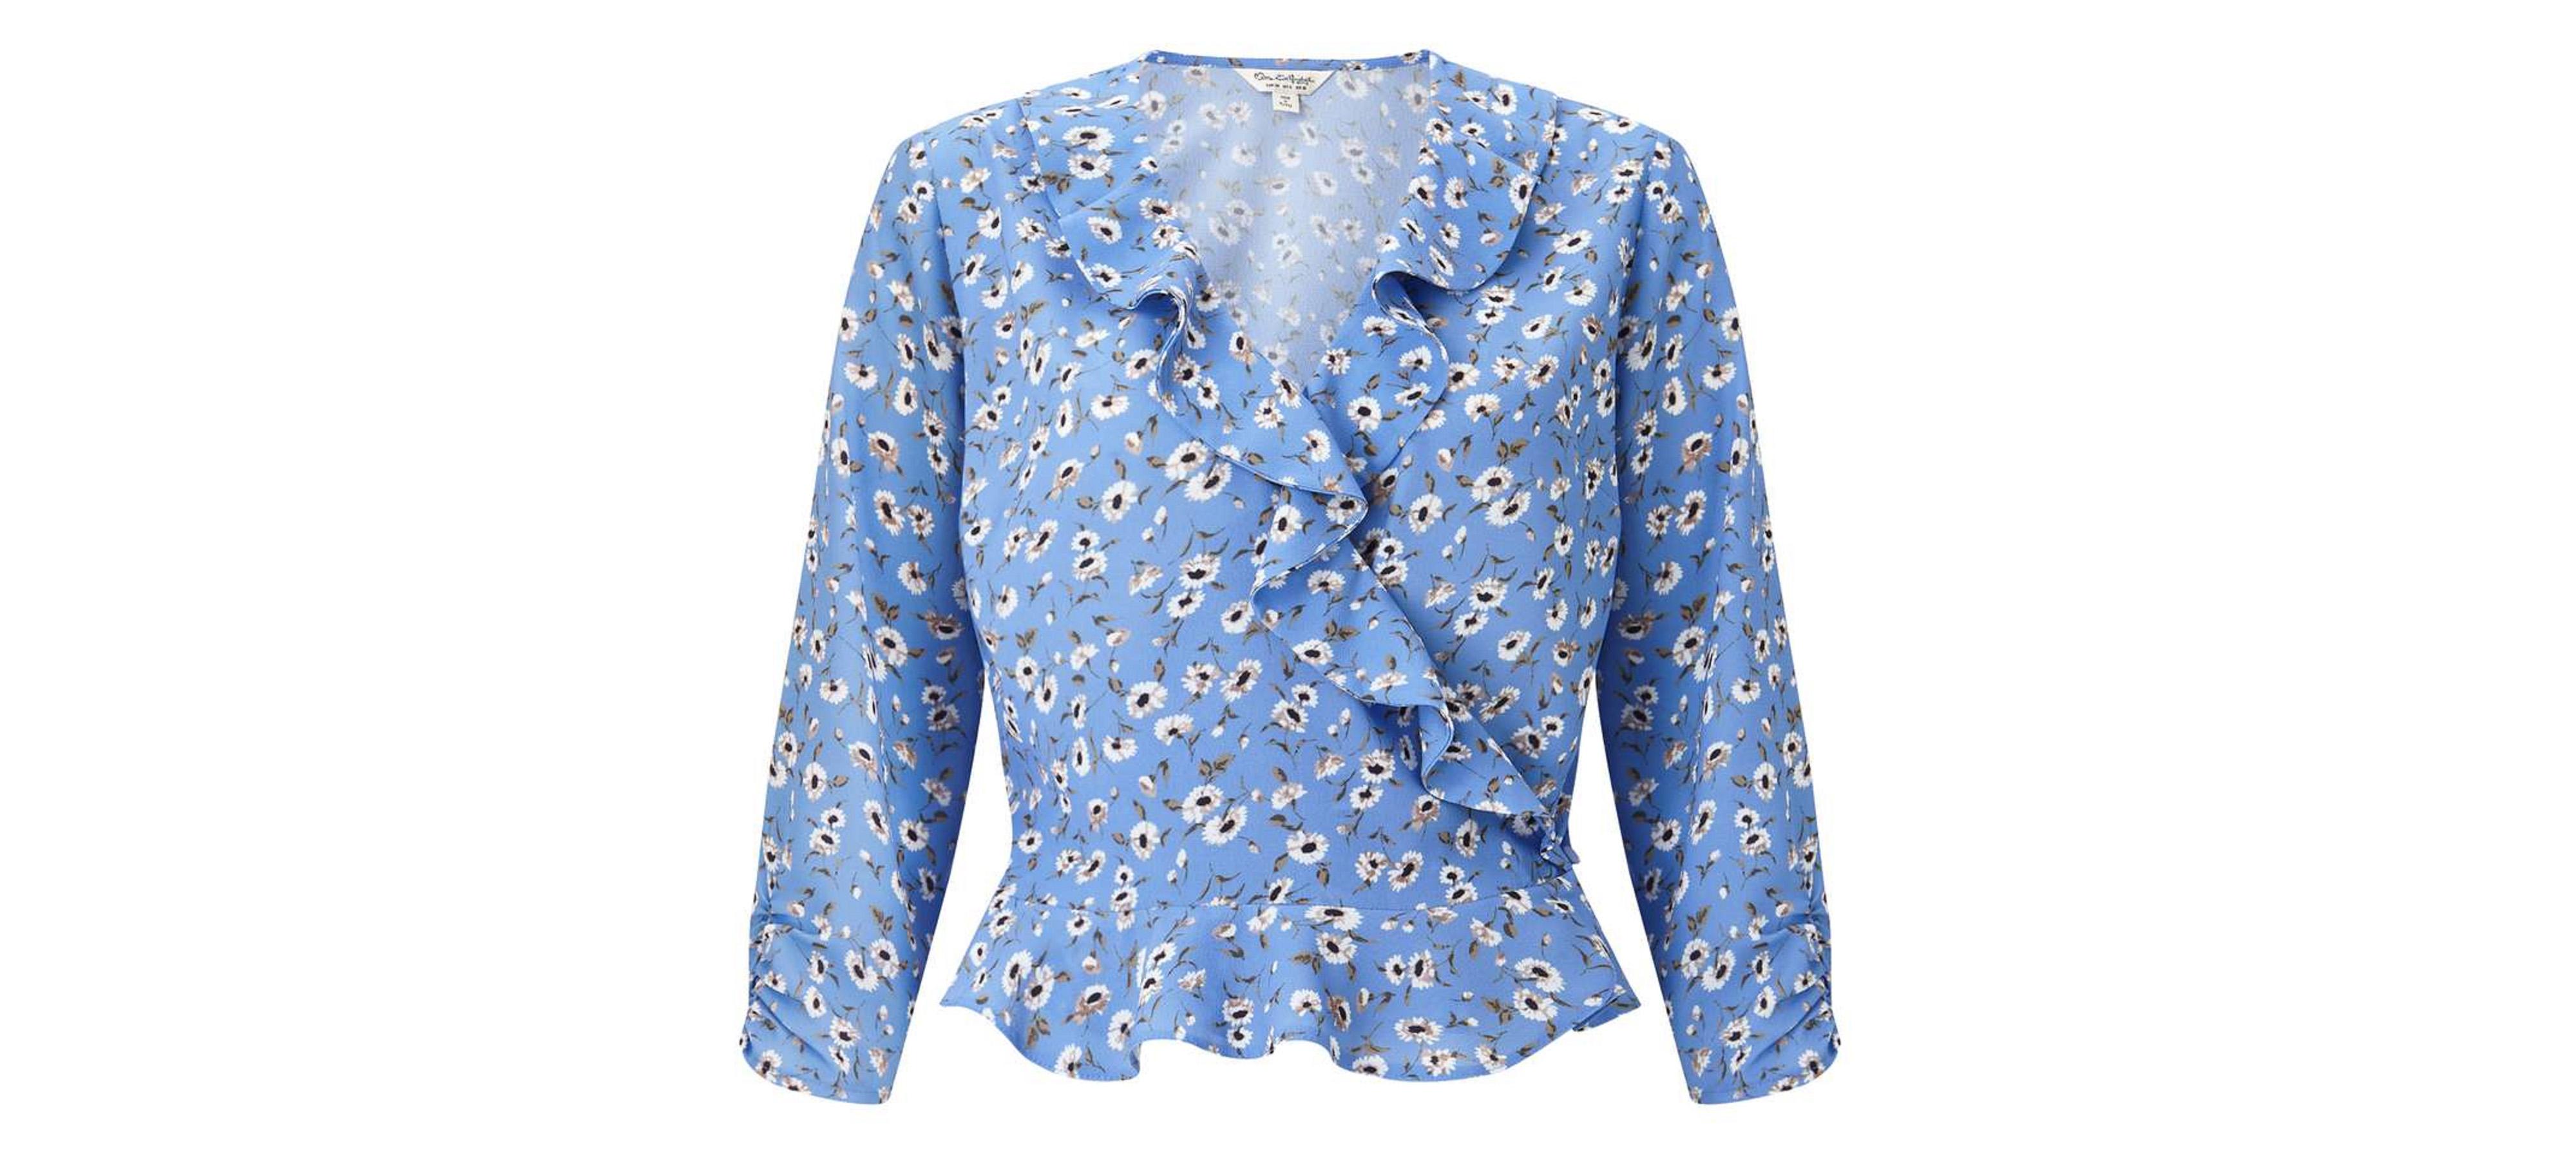 Miss Selfridge Blue Floral Print Ruffle Wrap Blouse